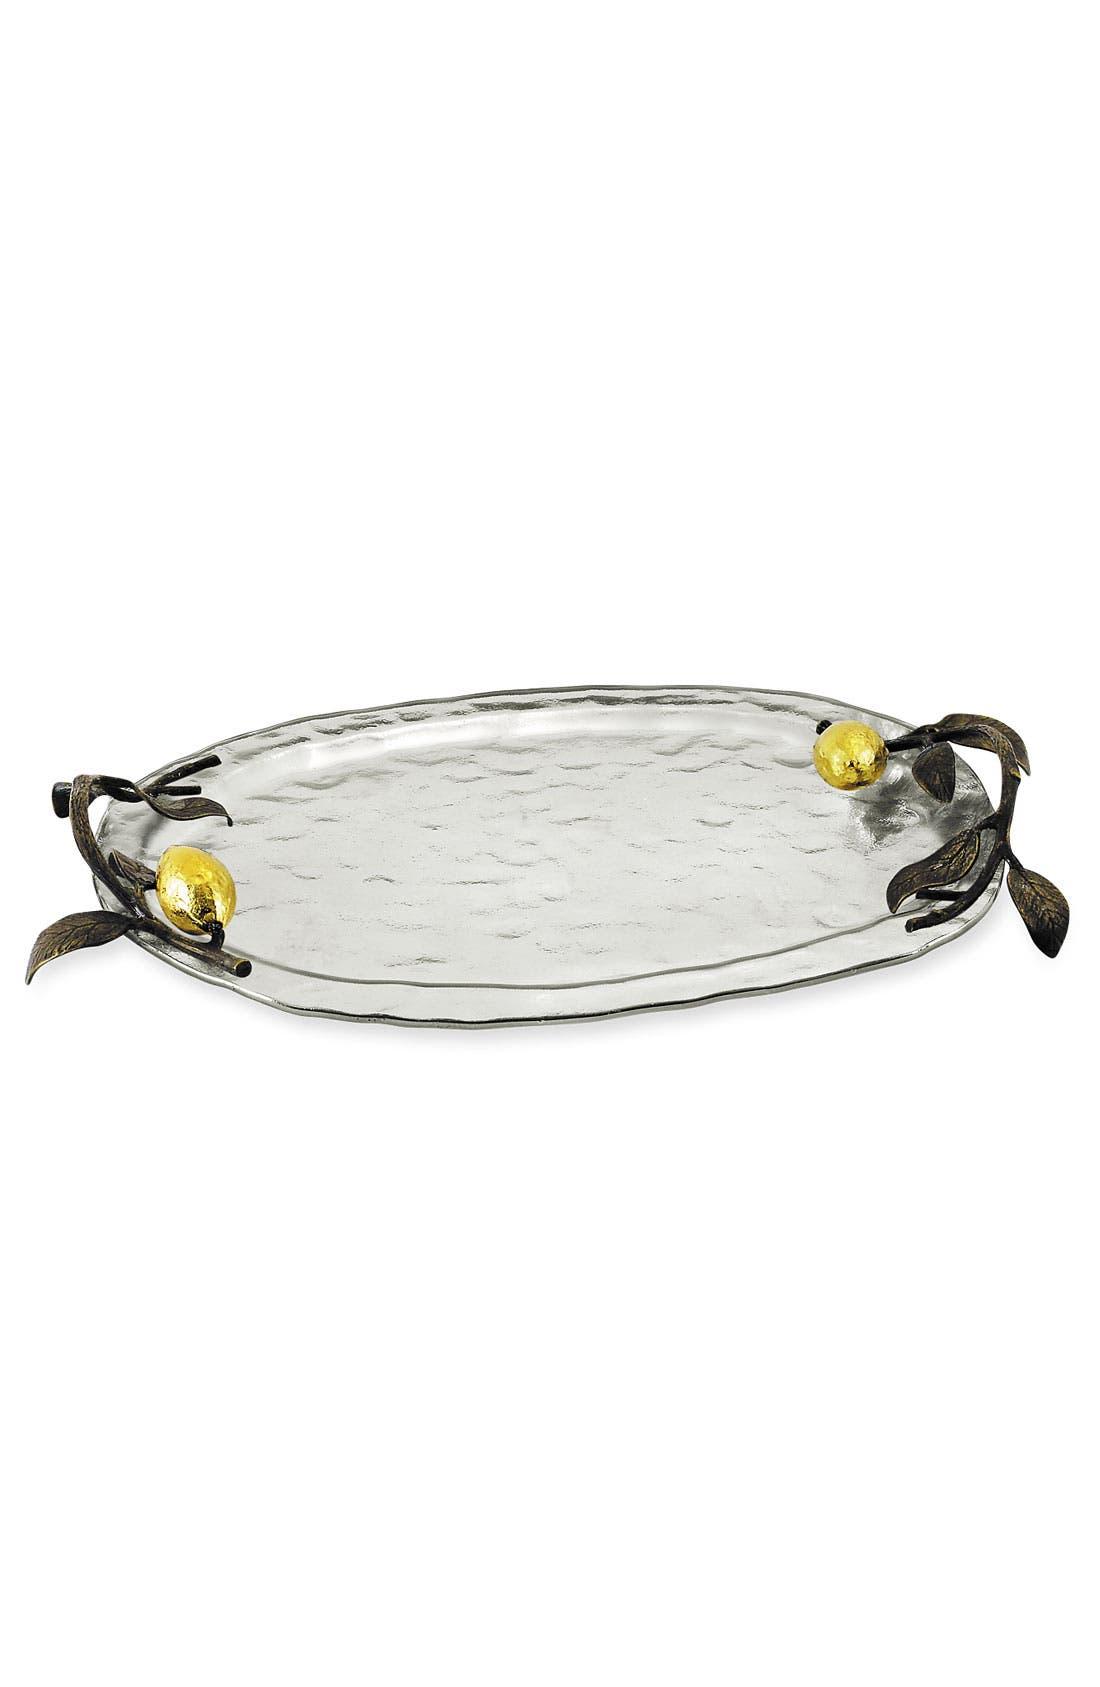 Main Image - Michael Aram 'Lemonwood' Plated Glass Tray